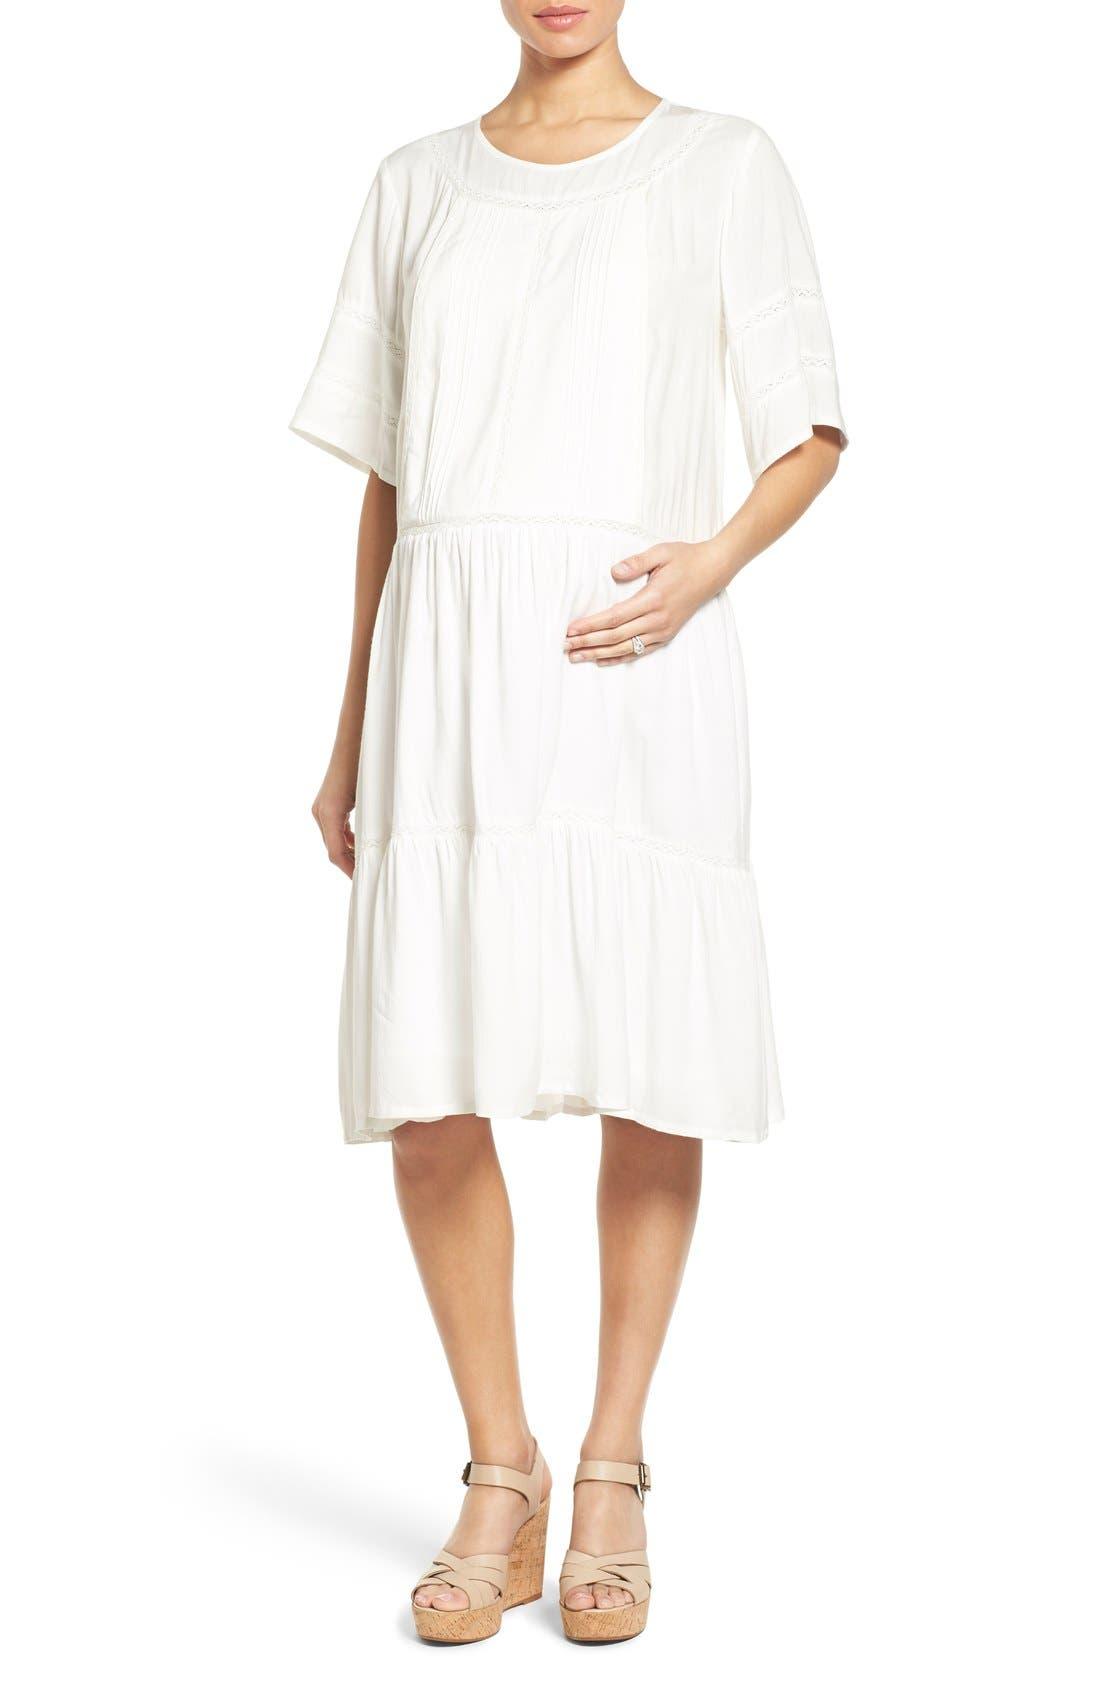 'Wild at Heart' Maternity/Nursing Midi Dress,                             Main thumbnail 1, color,